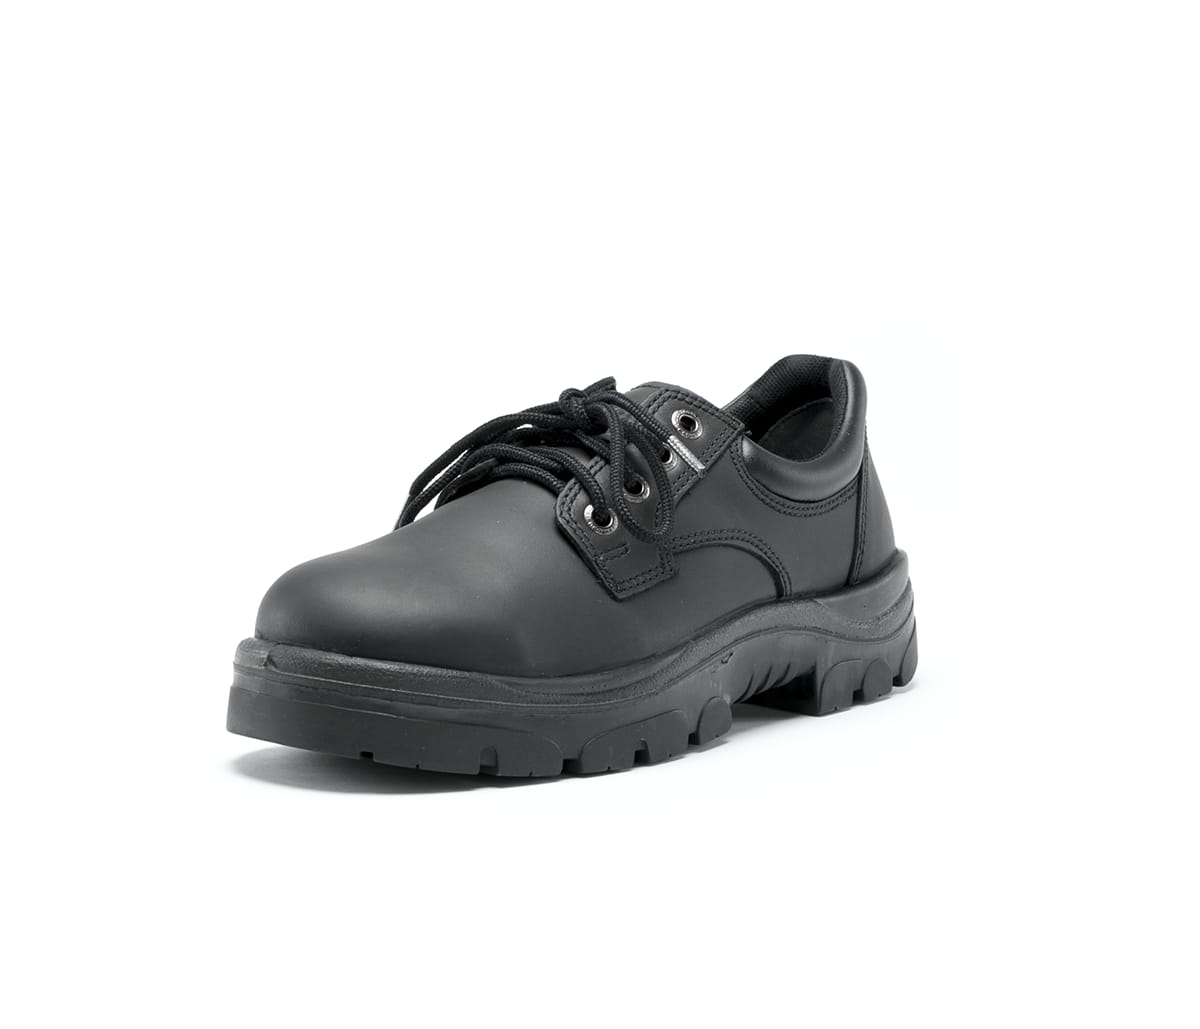 7f9963bf7d16 Eucla Steel Toe Cap Lace-Up Work Shoe